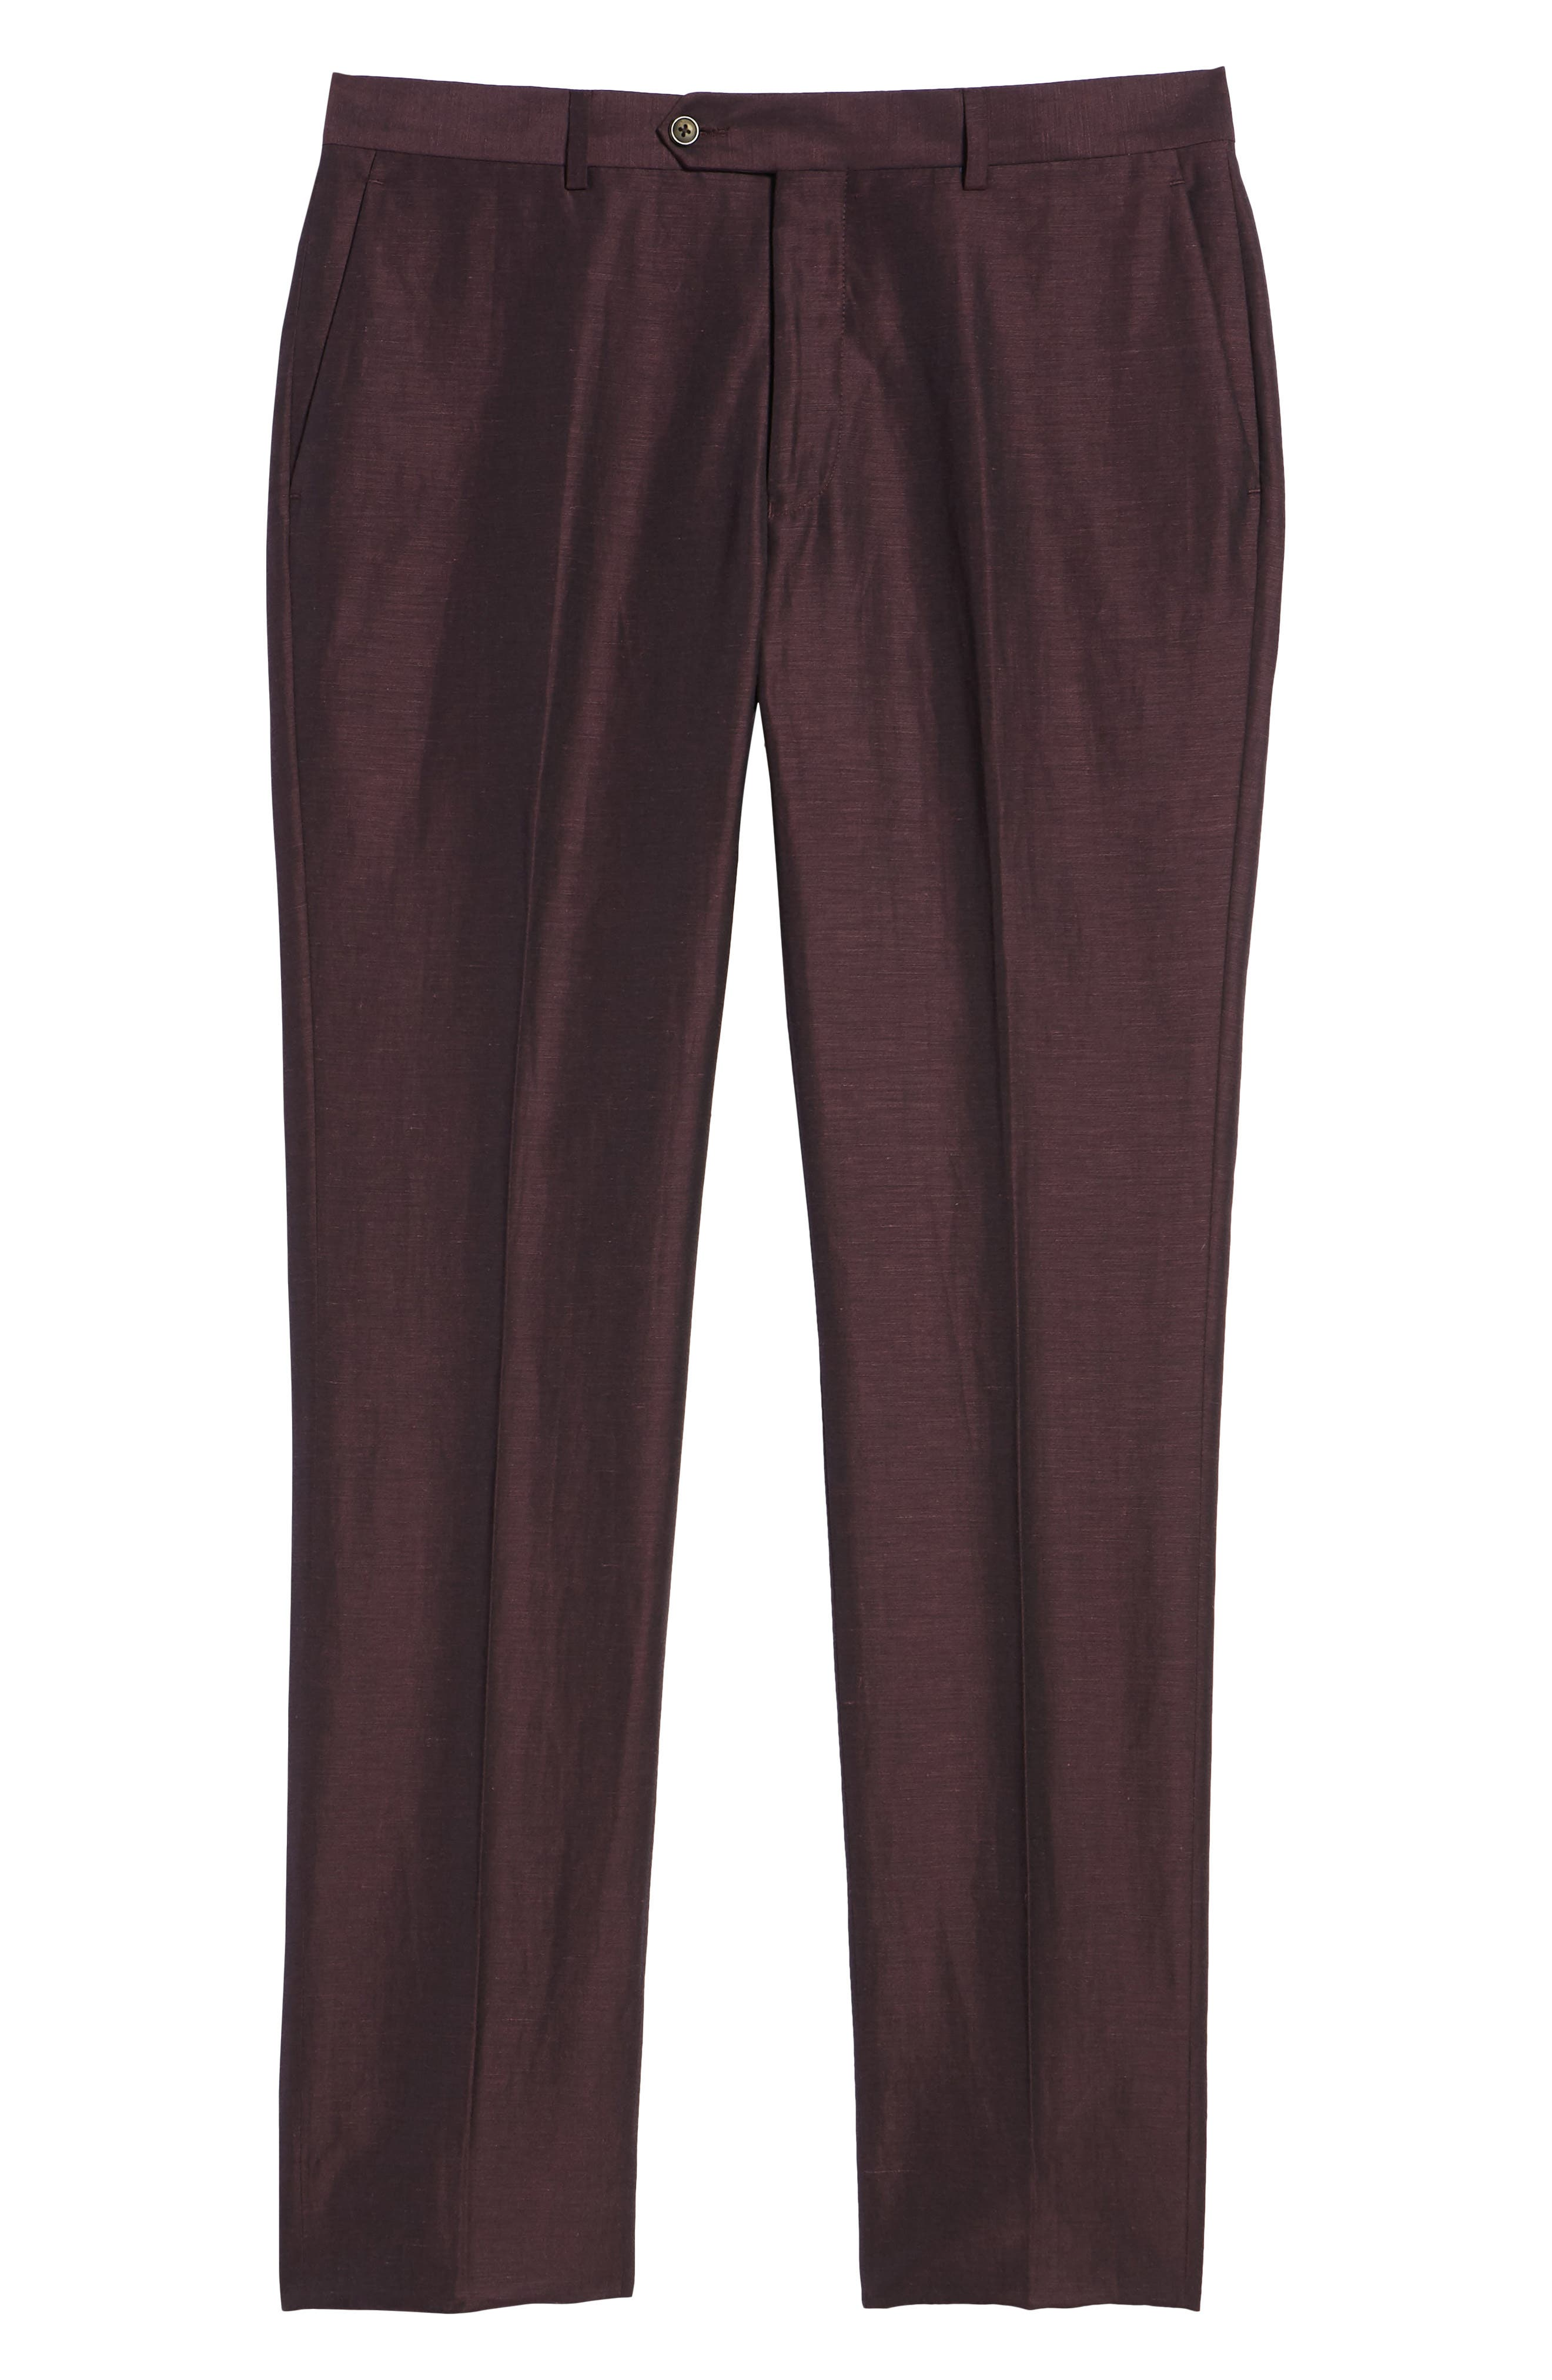 Dagger Flat Front Solid Wool & Linen Trousers,                             Alternate thumbnail 6, color,                             Plum